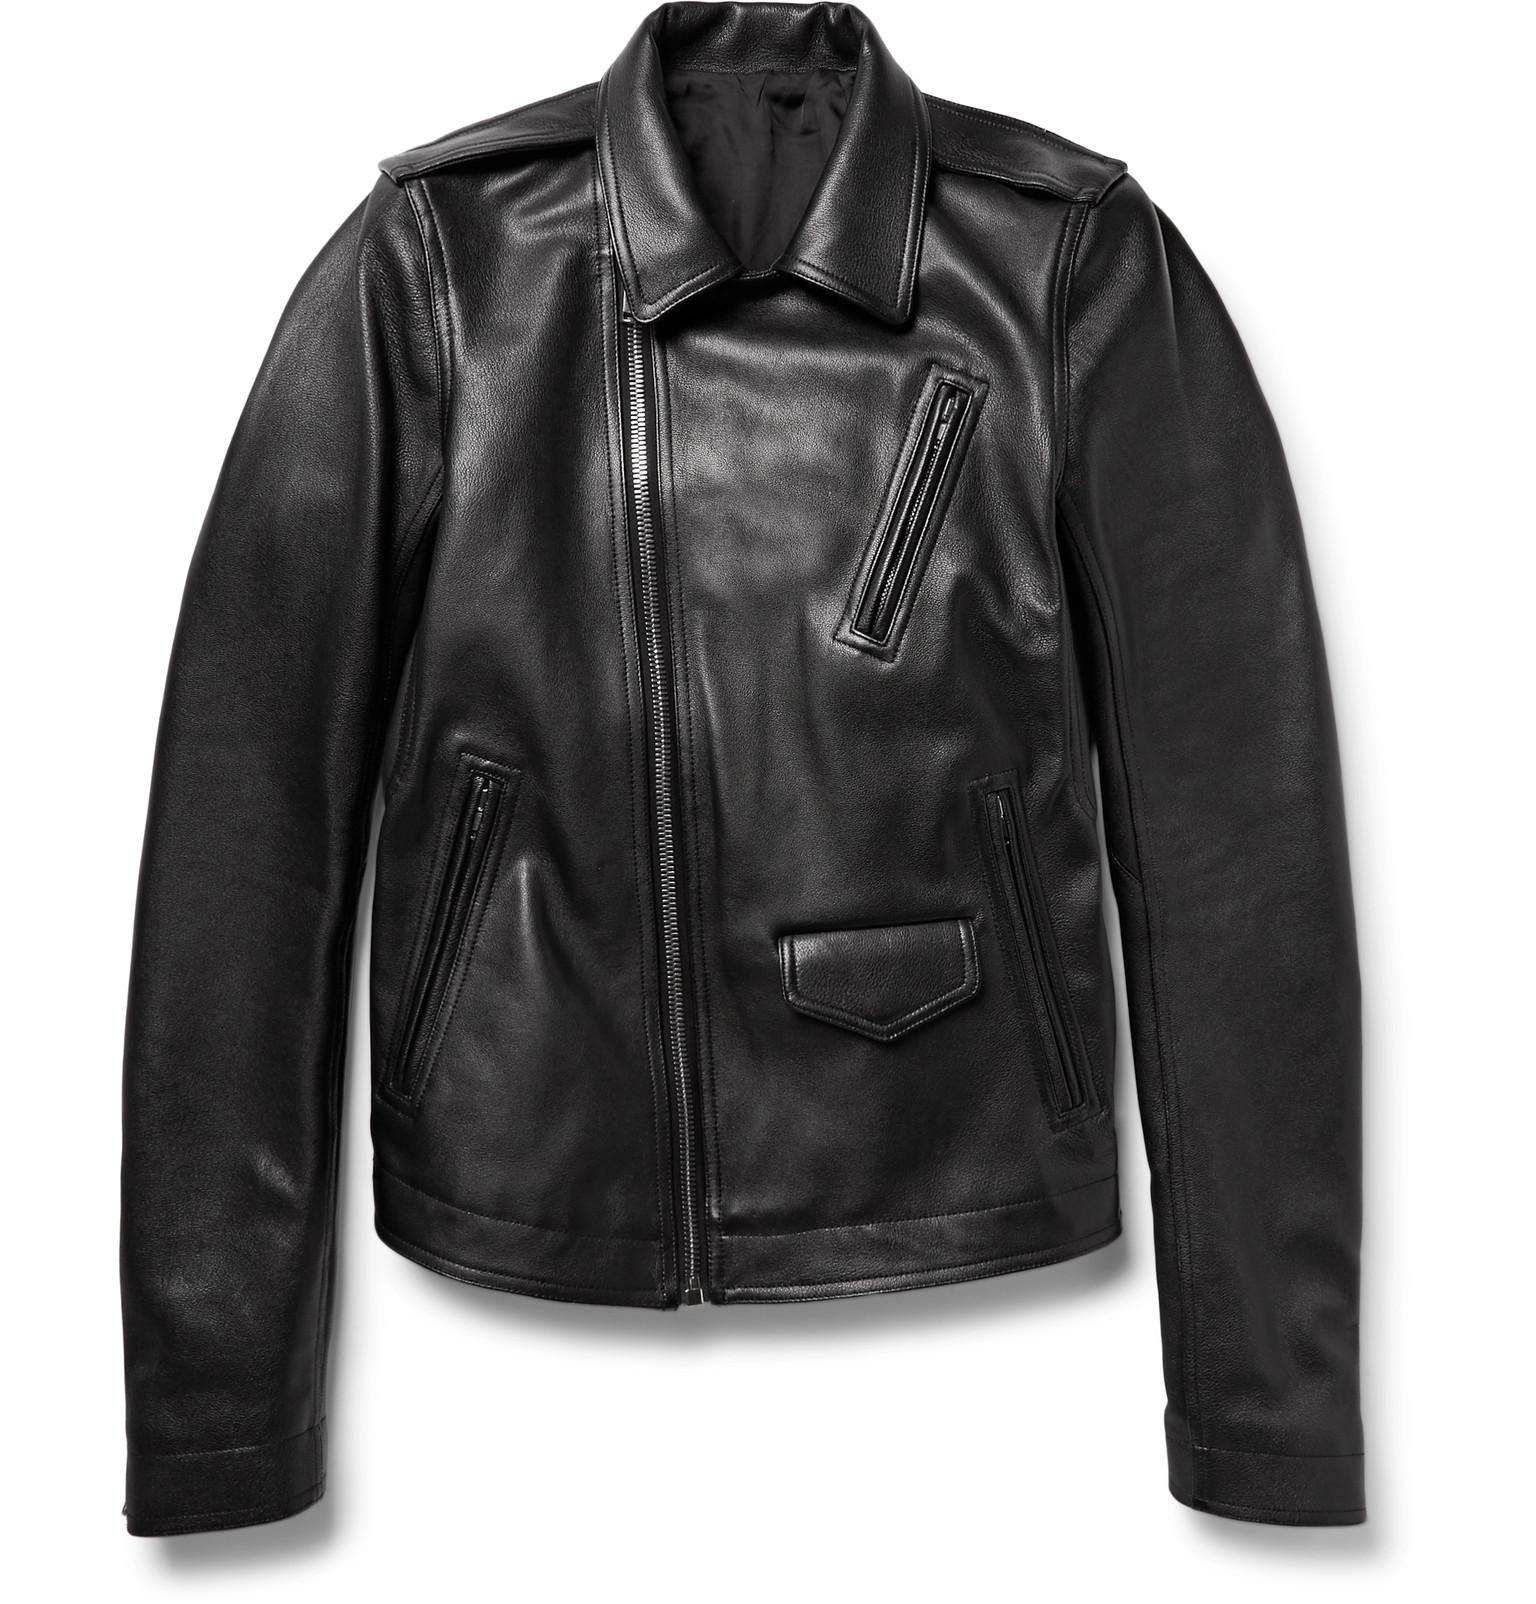 Leather jacket aesthetic - Rick Owens Stooges Full Grain Leather Jacket